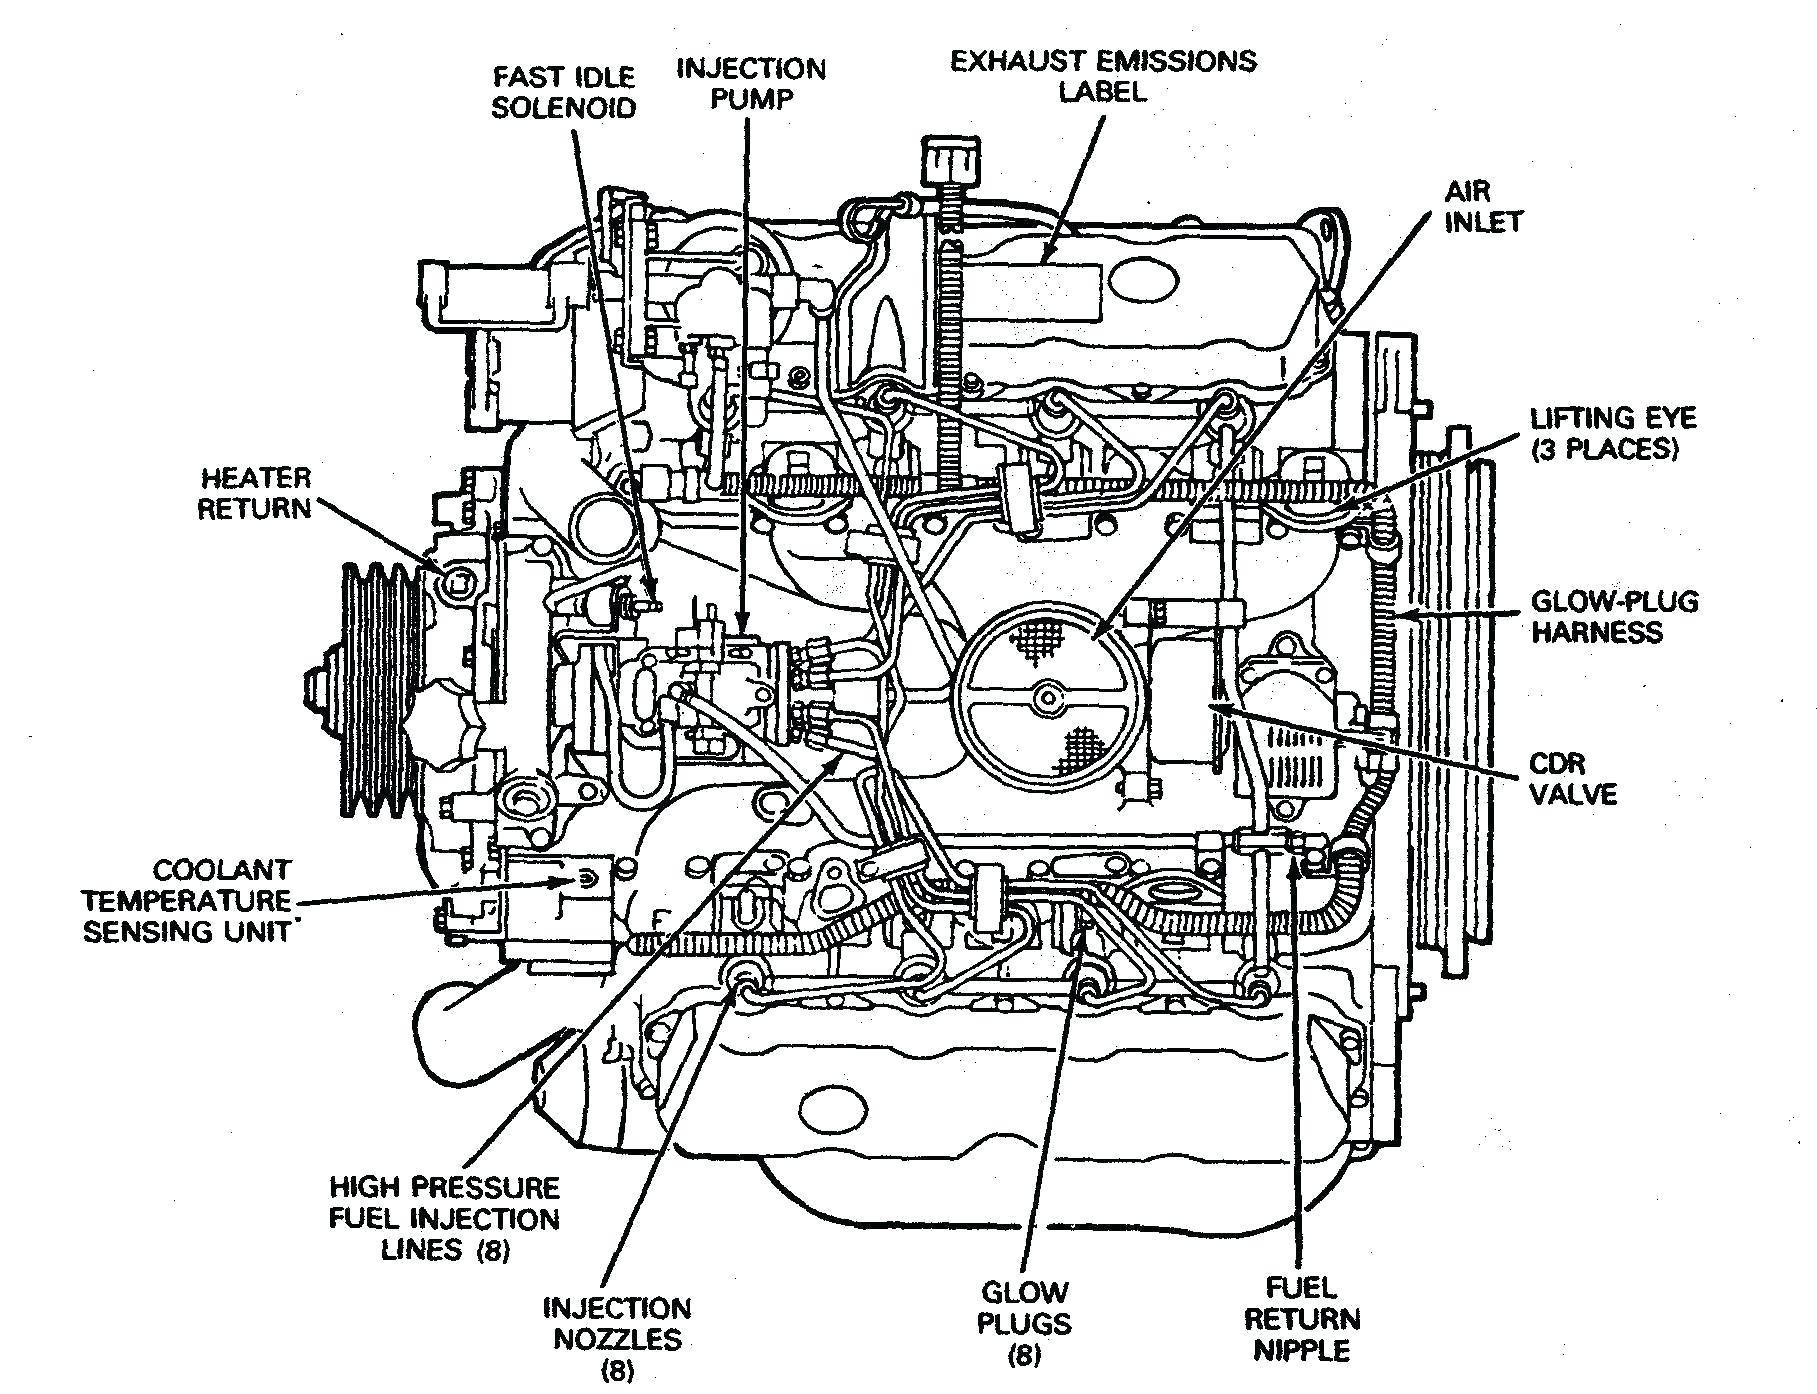 Ford Explorer Engine Diagram Kawasaki Engine Parts Diagram Delighted Inspiration Of Ford Explorer Engine Diagram